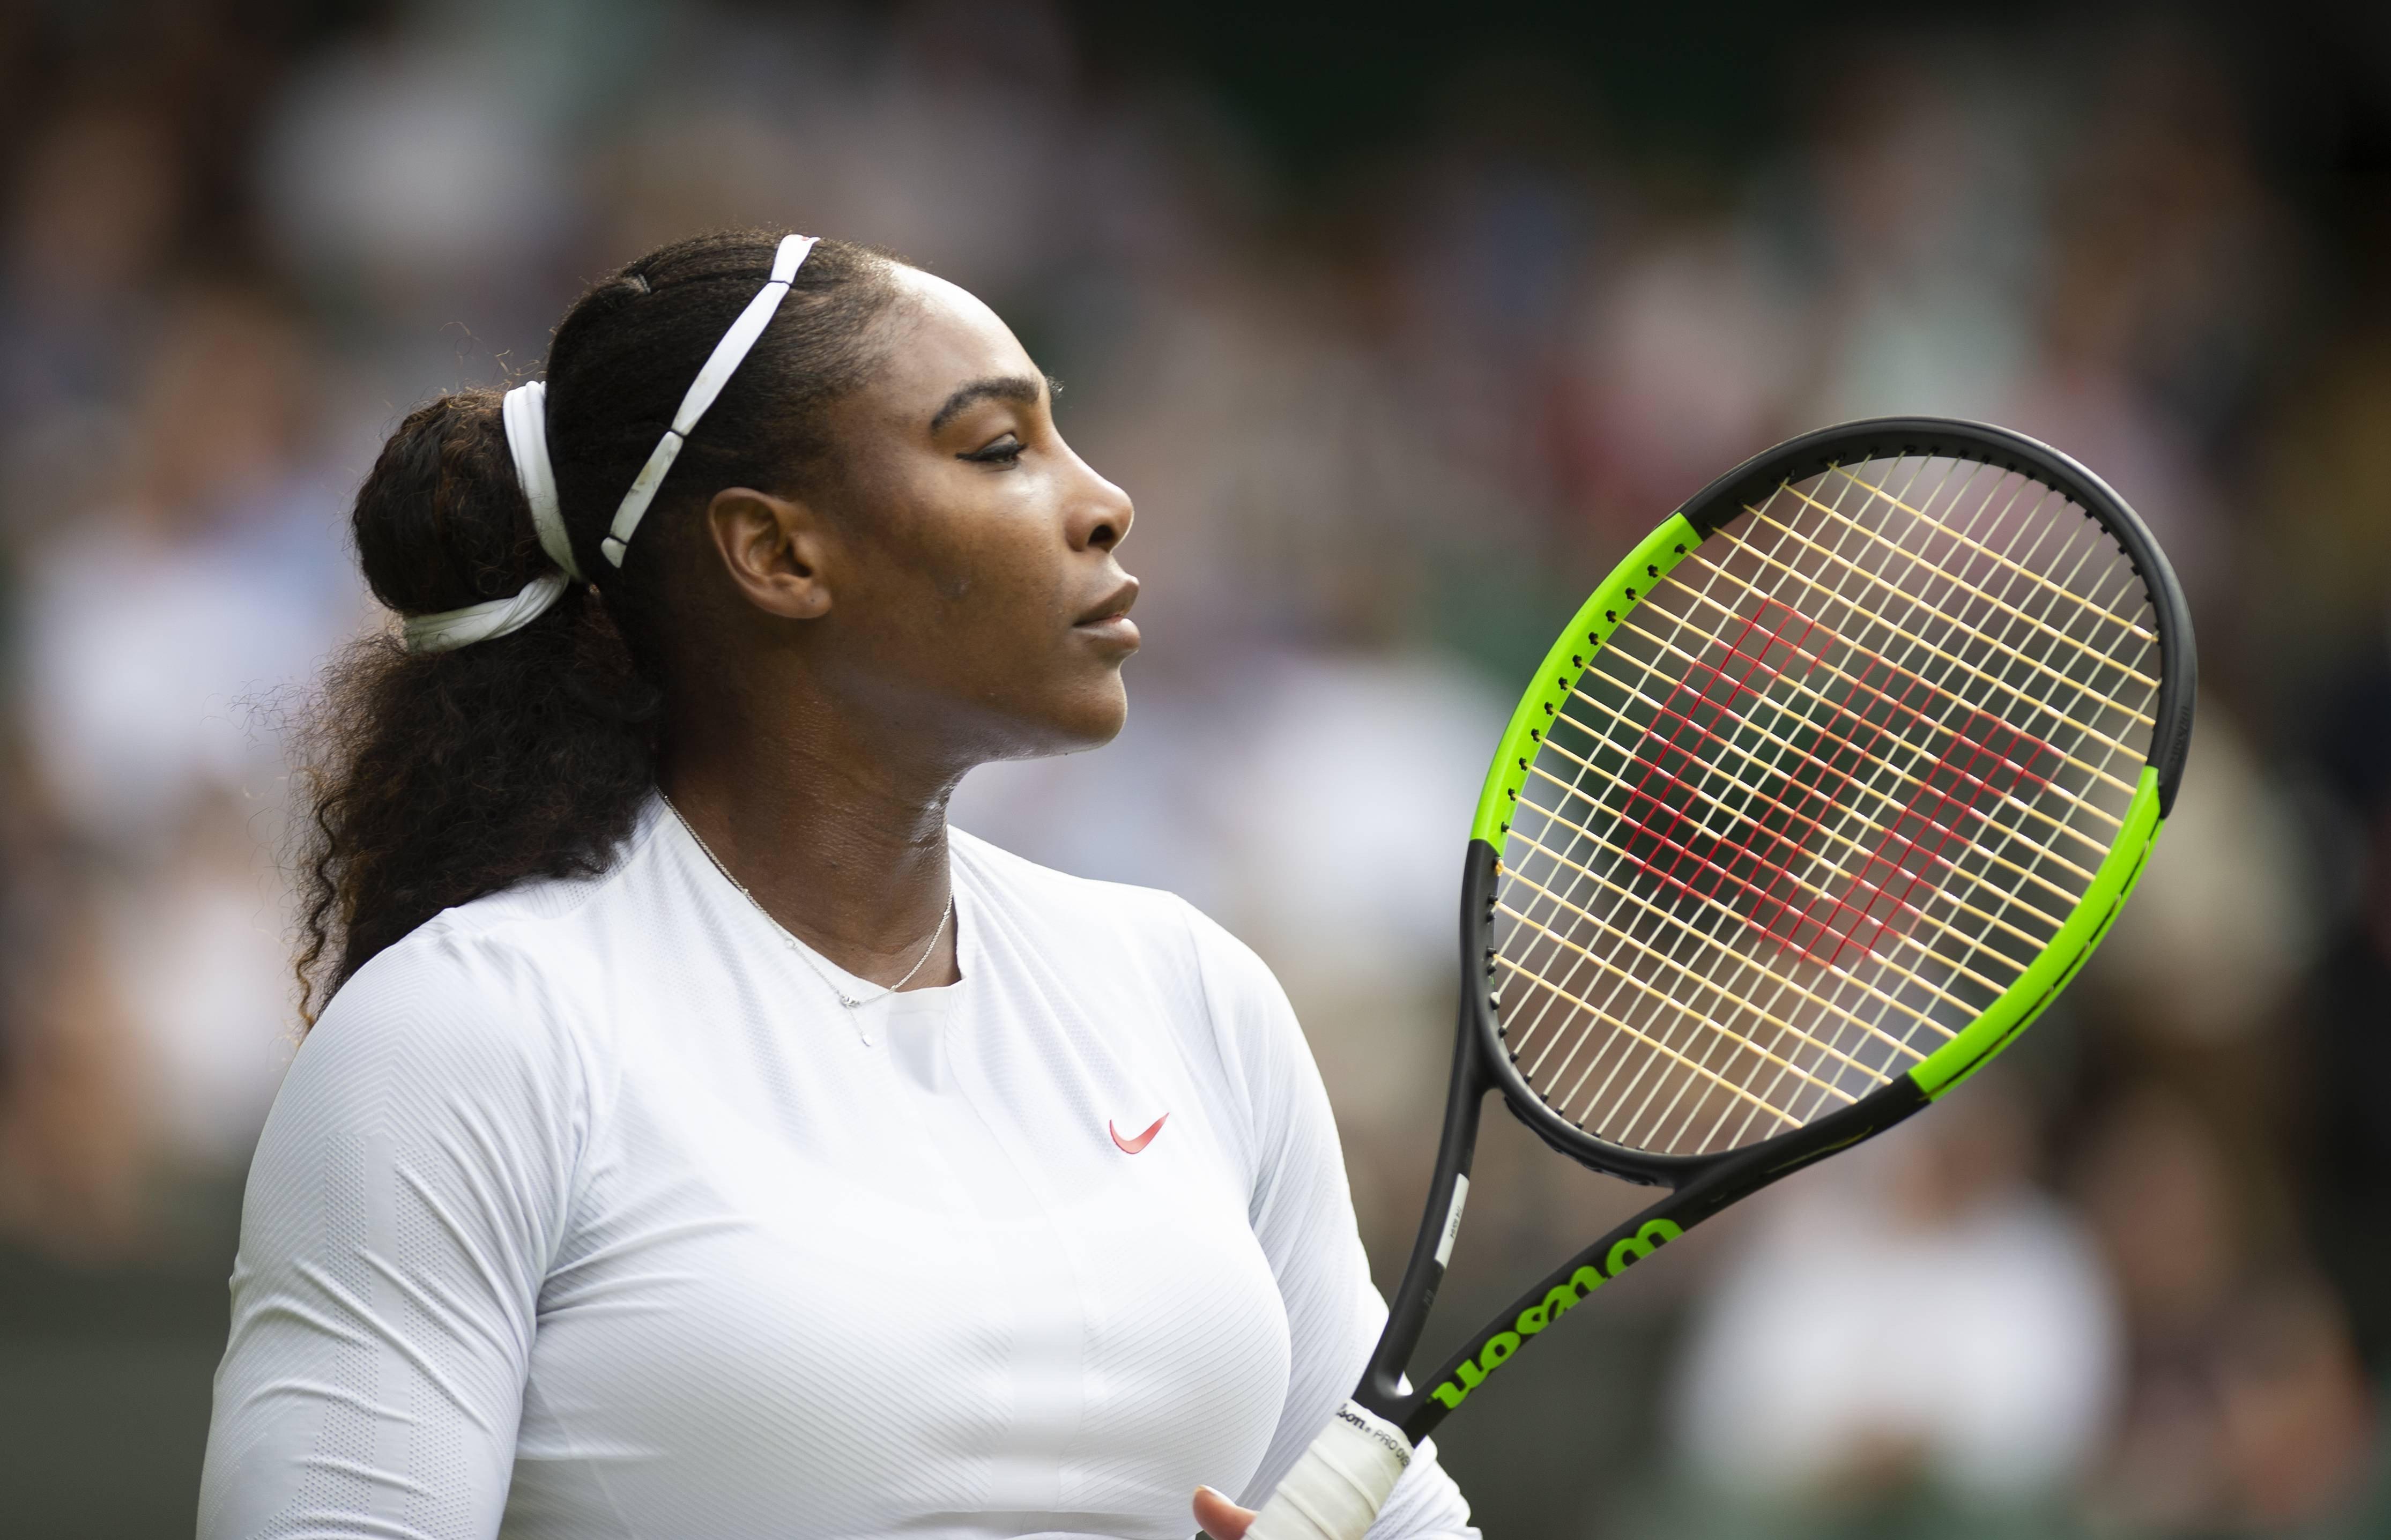 Golden opportunity' awaits Serena at Wimbledon